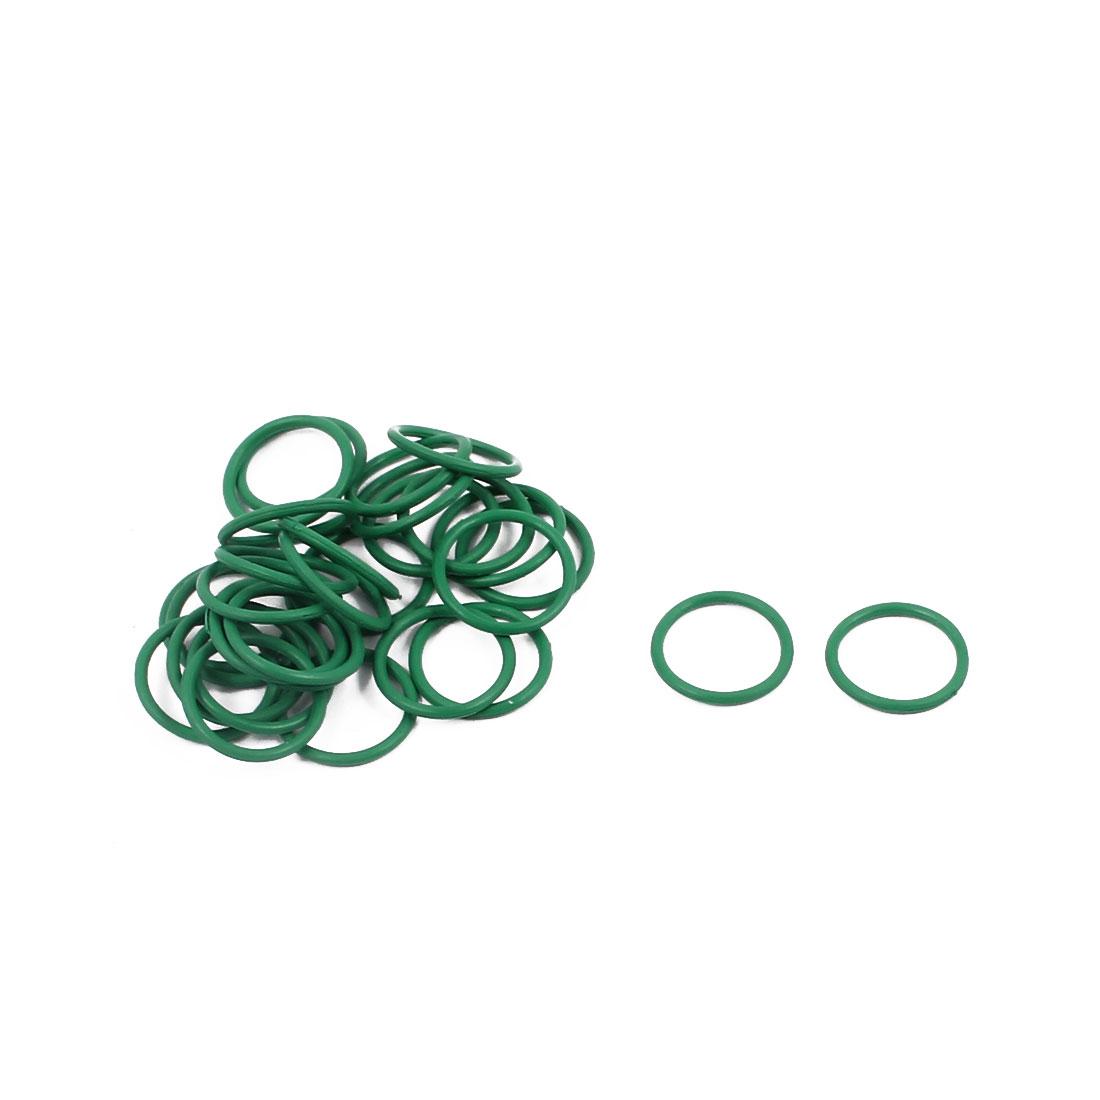 30Pcs 11mm x 1mm FKM O-rings Heat Resistant Sealing Ring Grommets Green